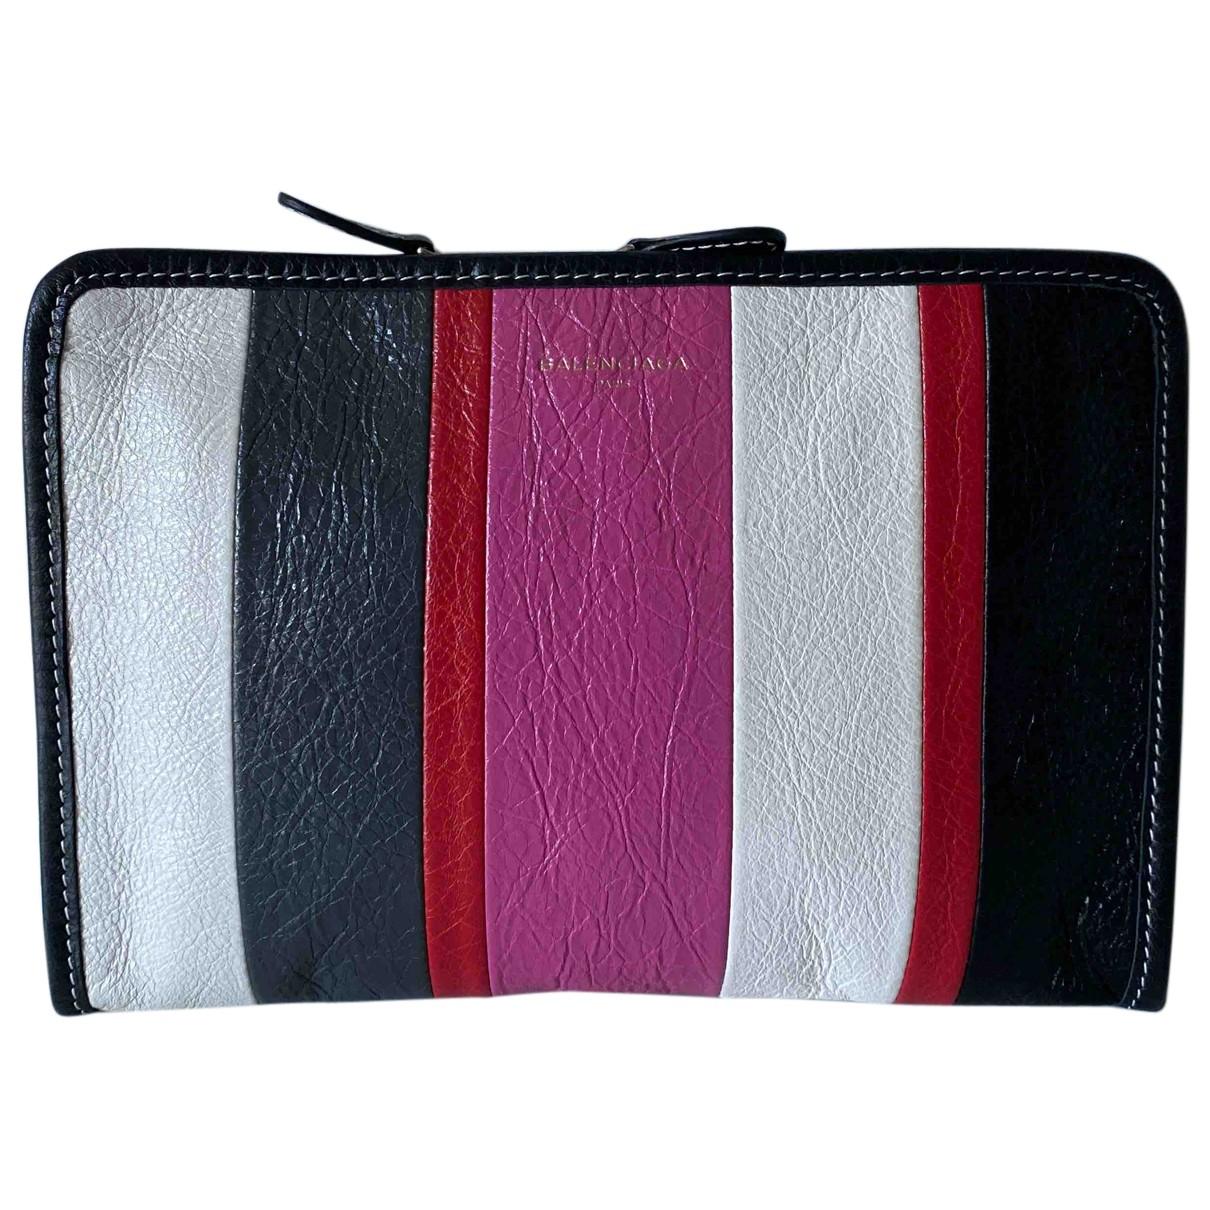 Balenciaga Bazar Bag Clutch in  Bunt Leder